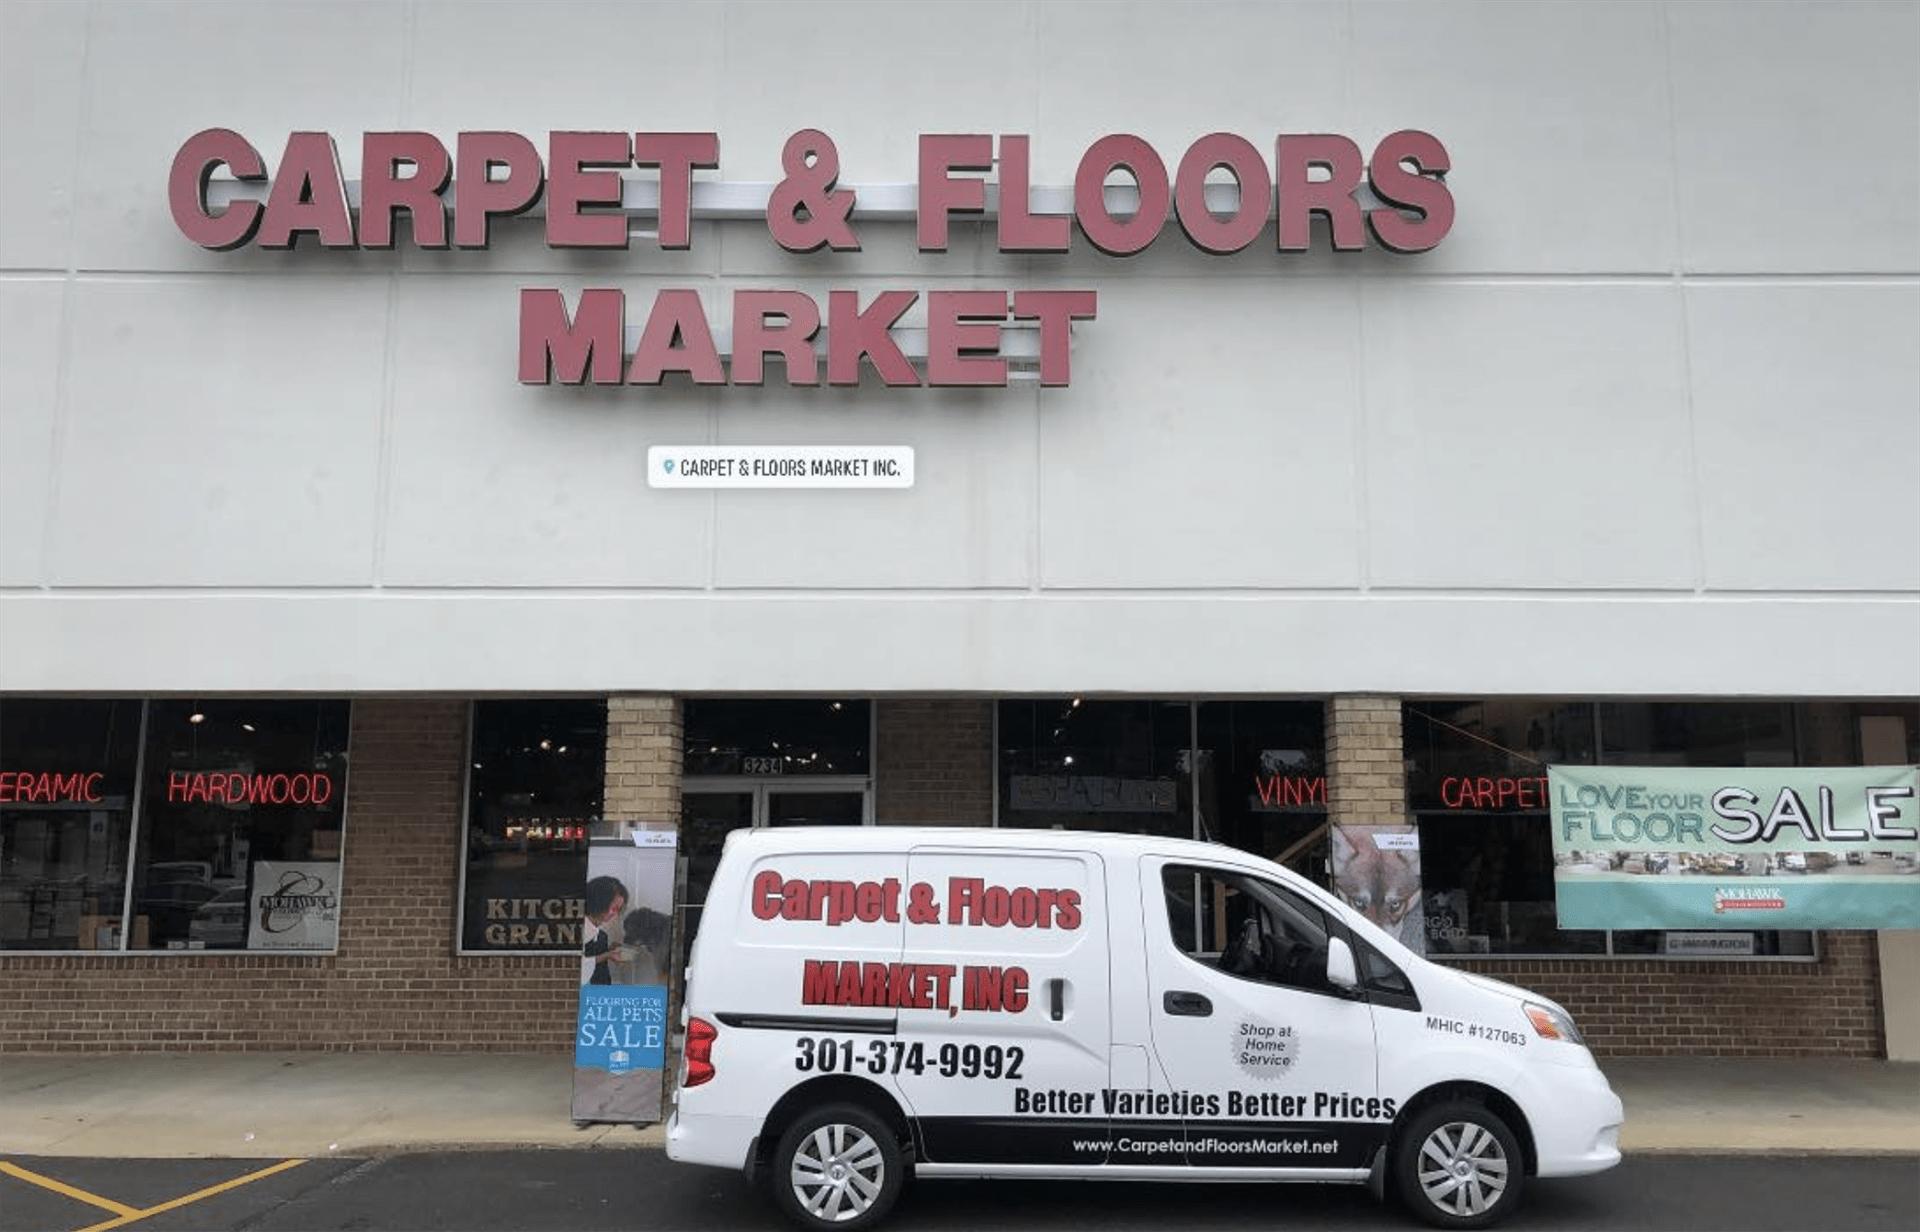 Carpet & Floors Market showroom near Waldorf, MD